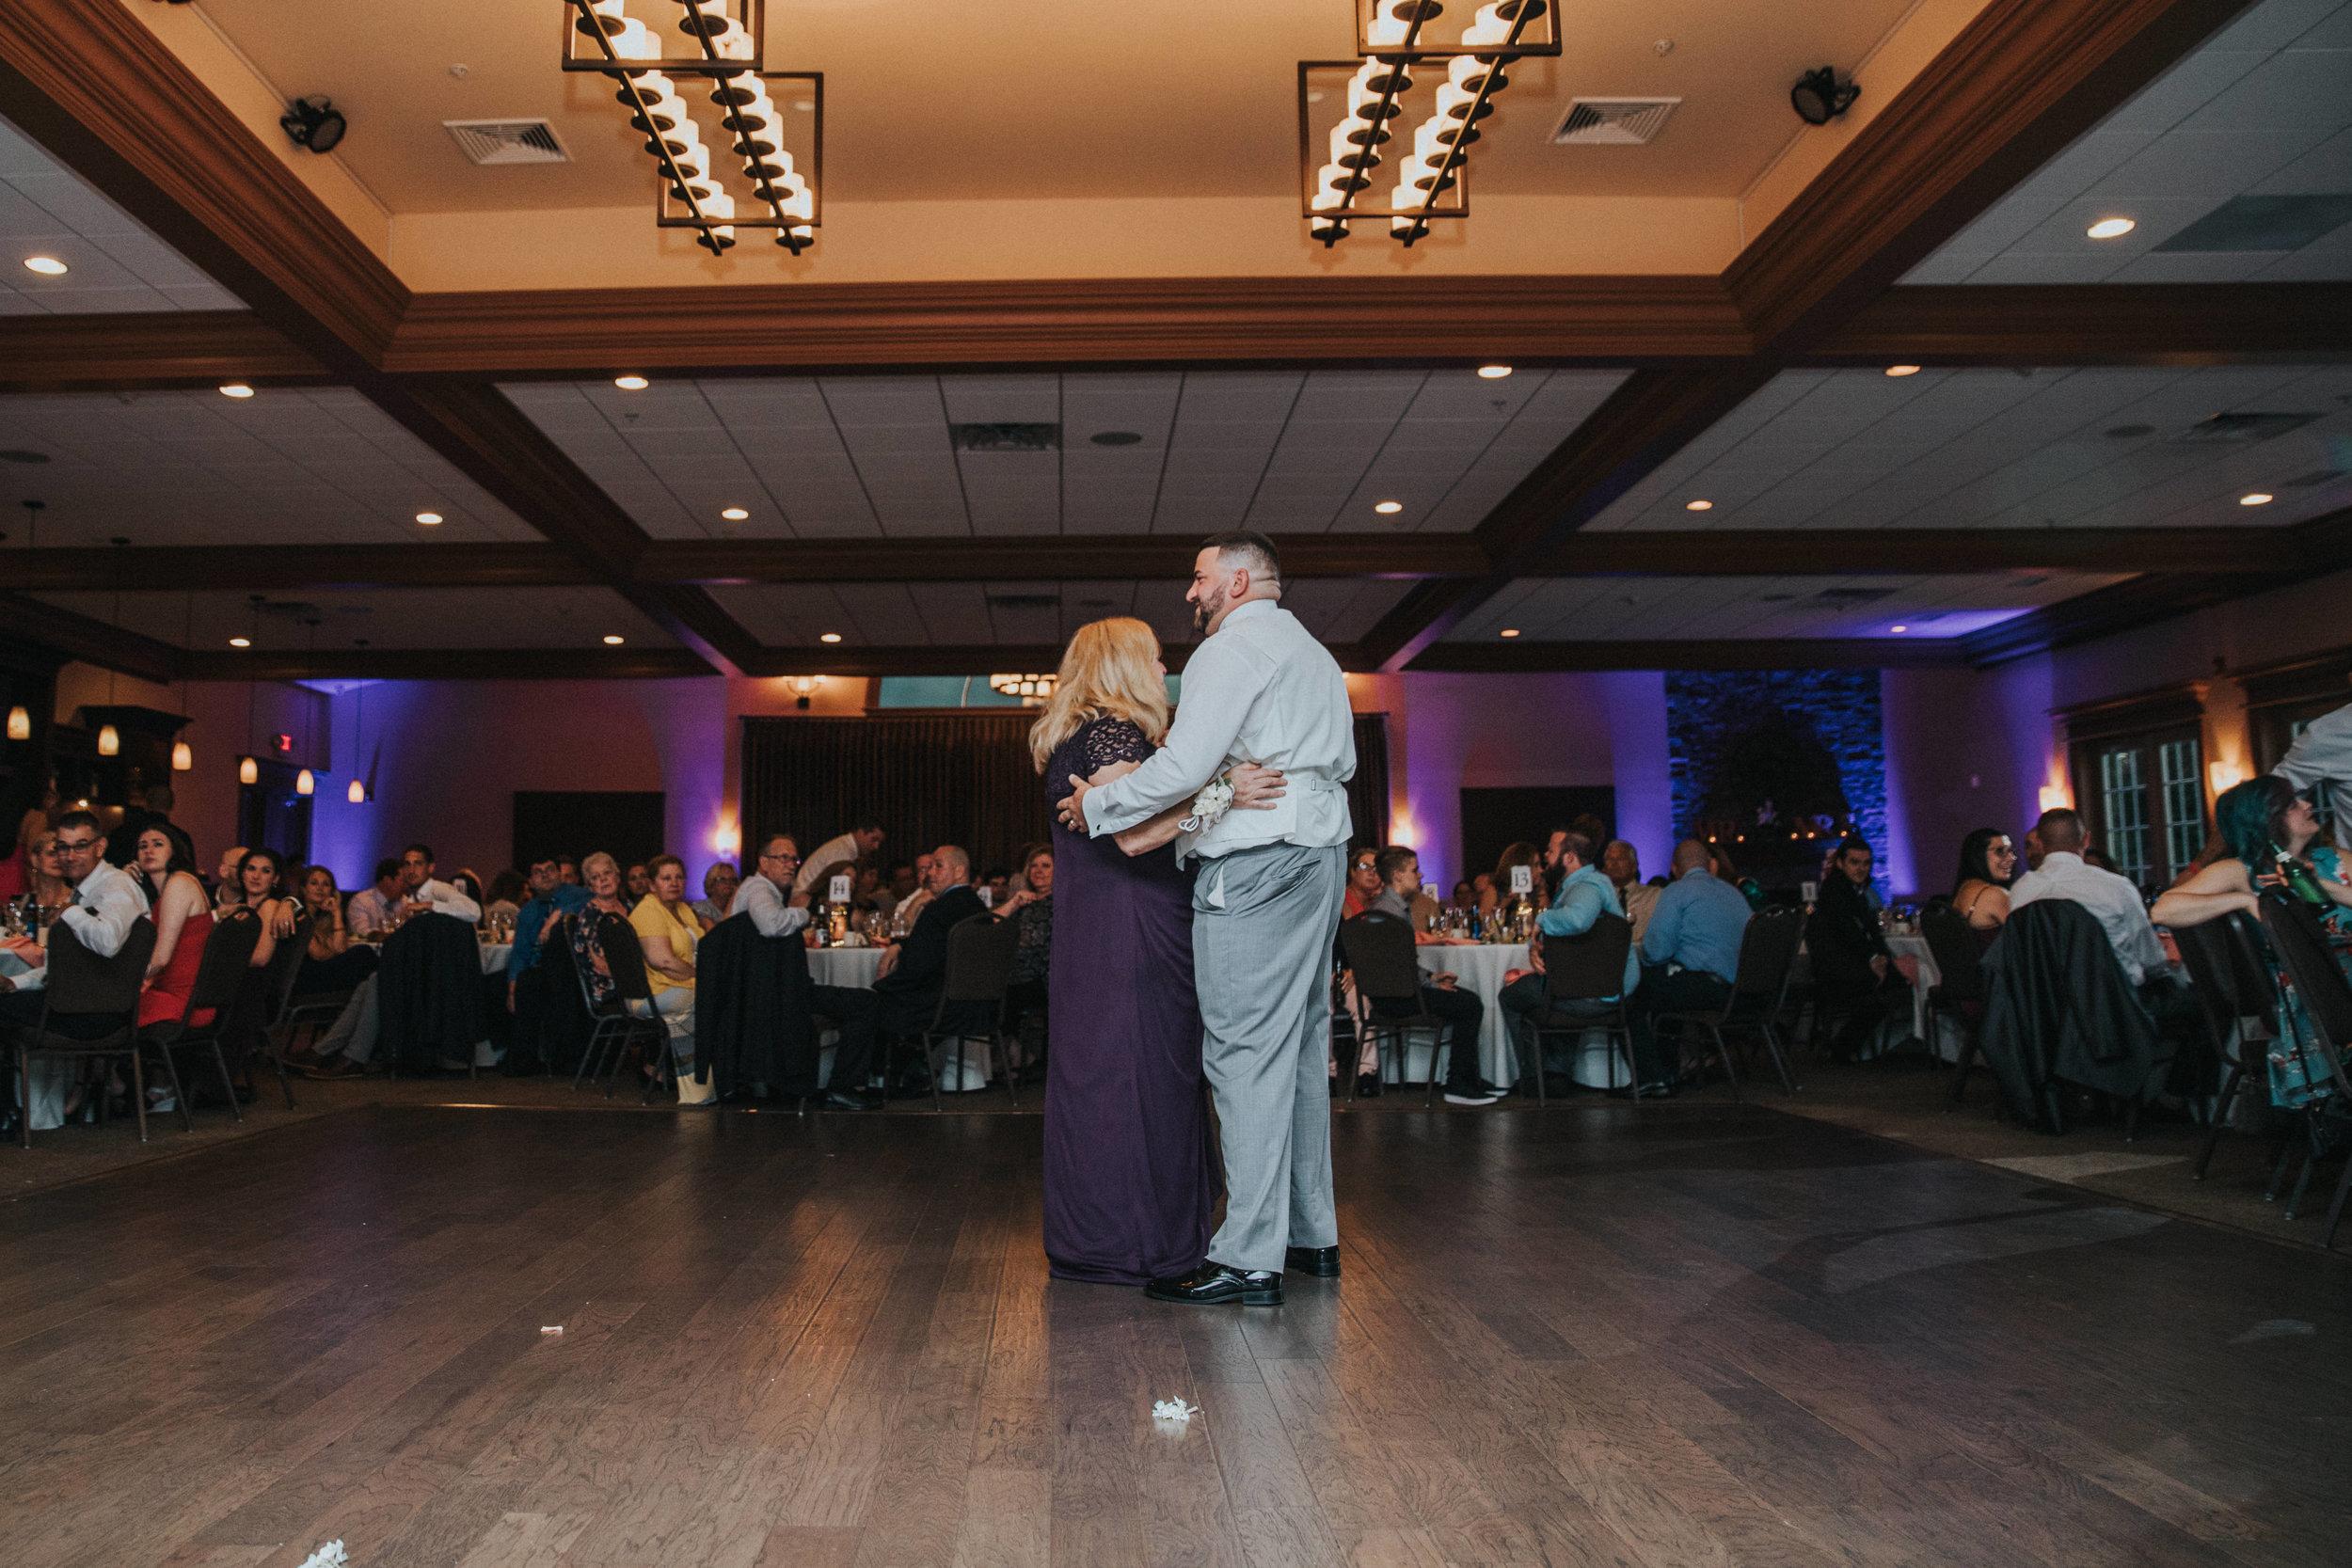 New-Jersey-Wedding-Photographer-JennaLynnPhotography-ValenzanoWinery-Reception-53.jpg